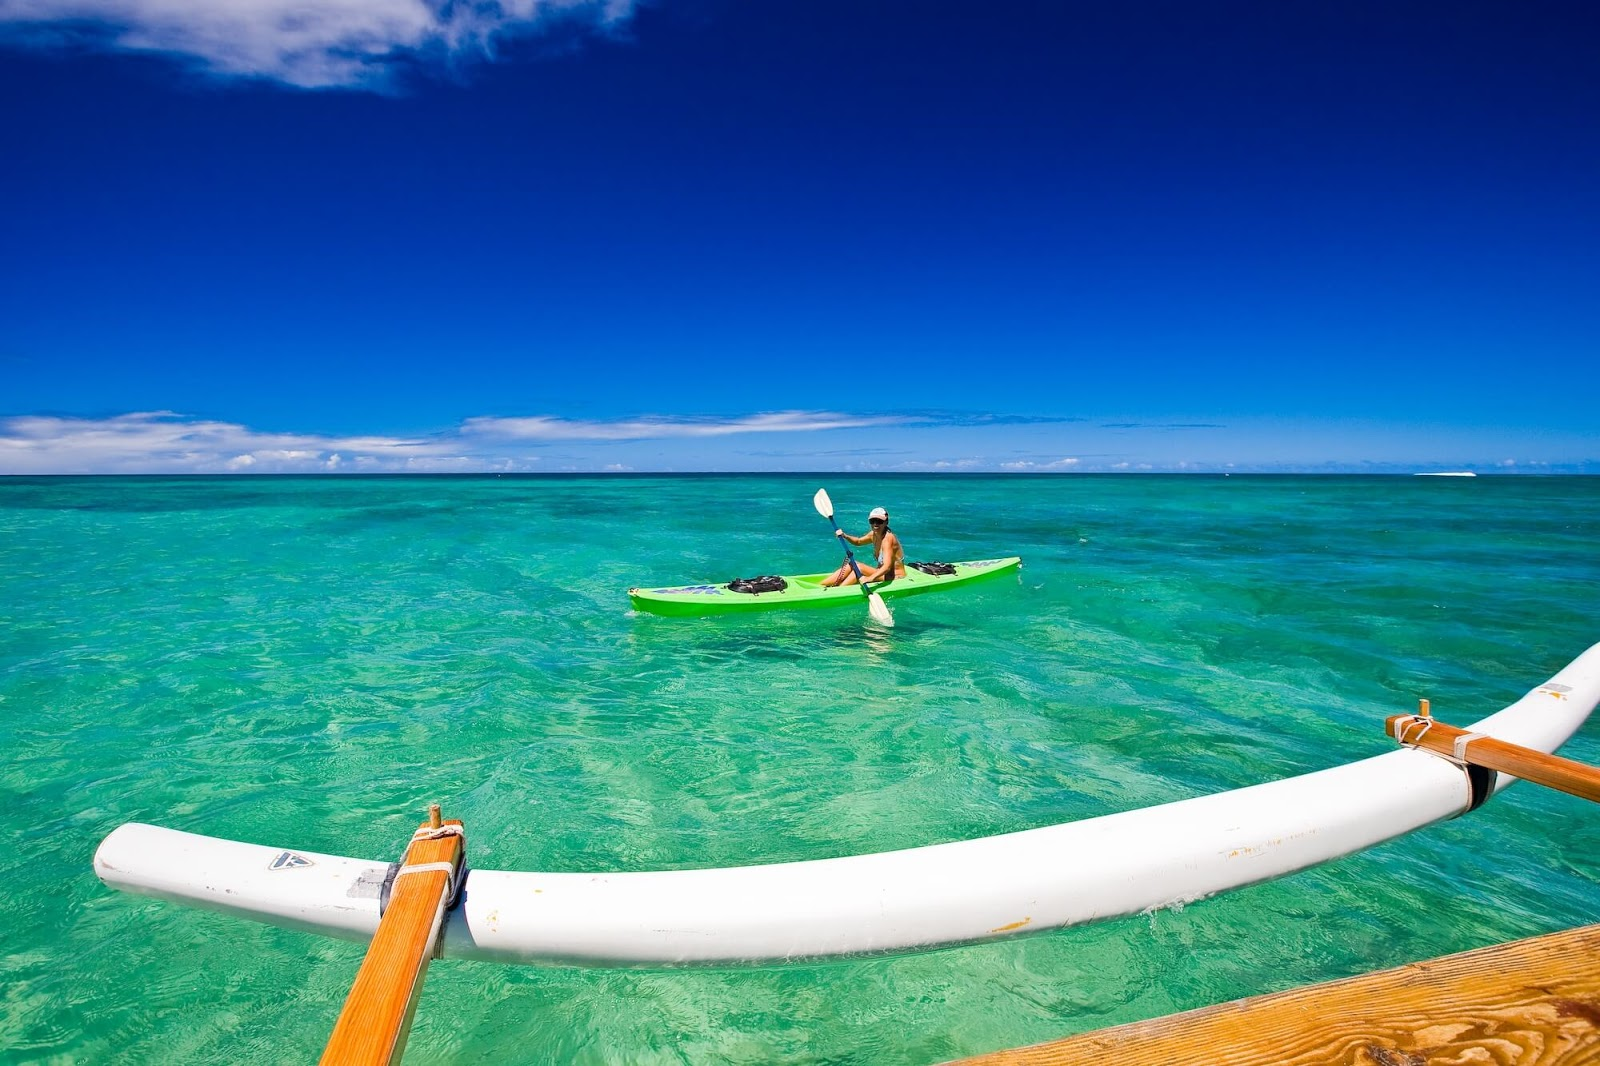 Kailua Beach Kayak.  Best Honolulu-Oahu Attractions - Things to Do in Honolulu-Oahu